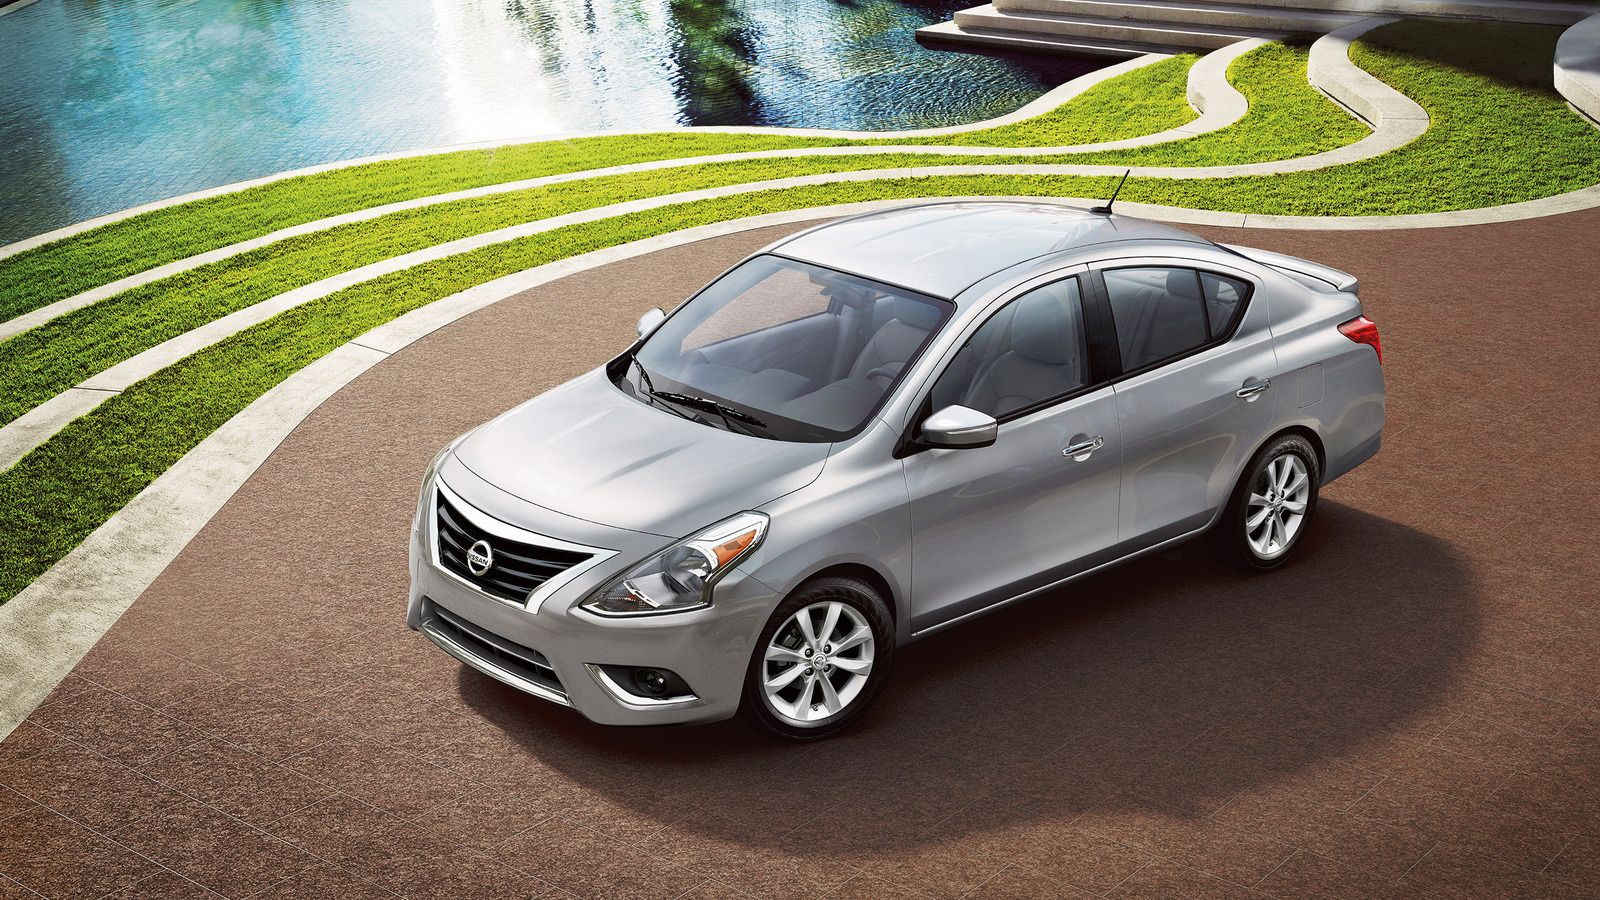 2016 Nissan Versa Nissan Versa Nissan Sunny Sedan